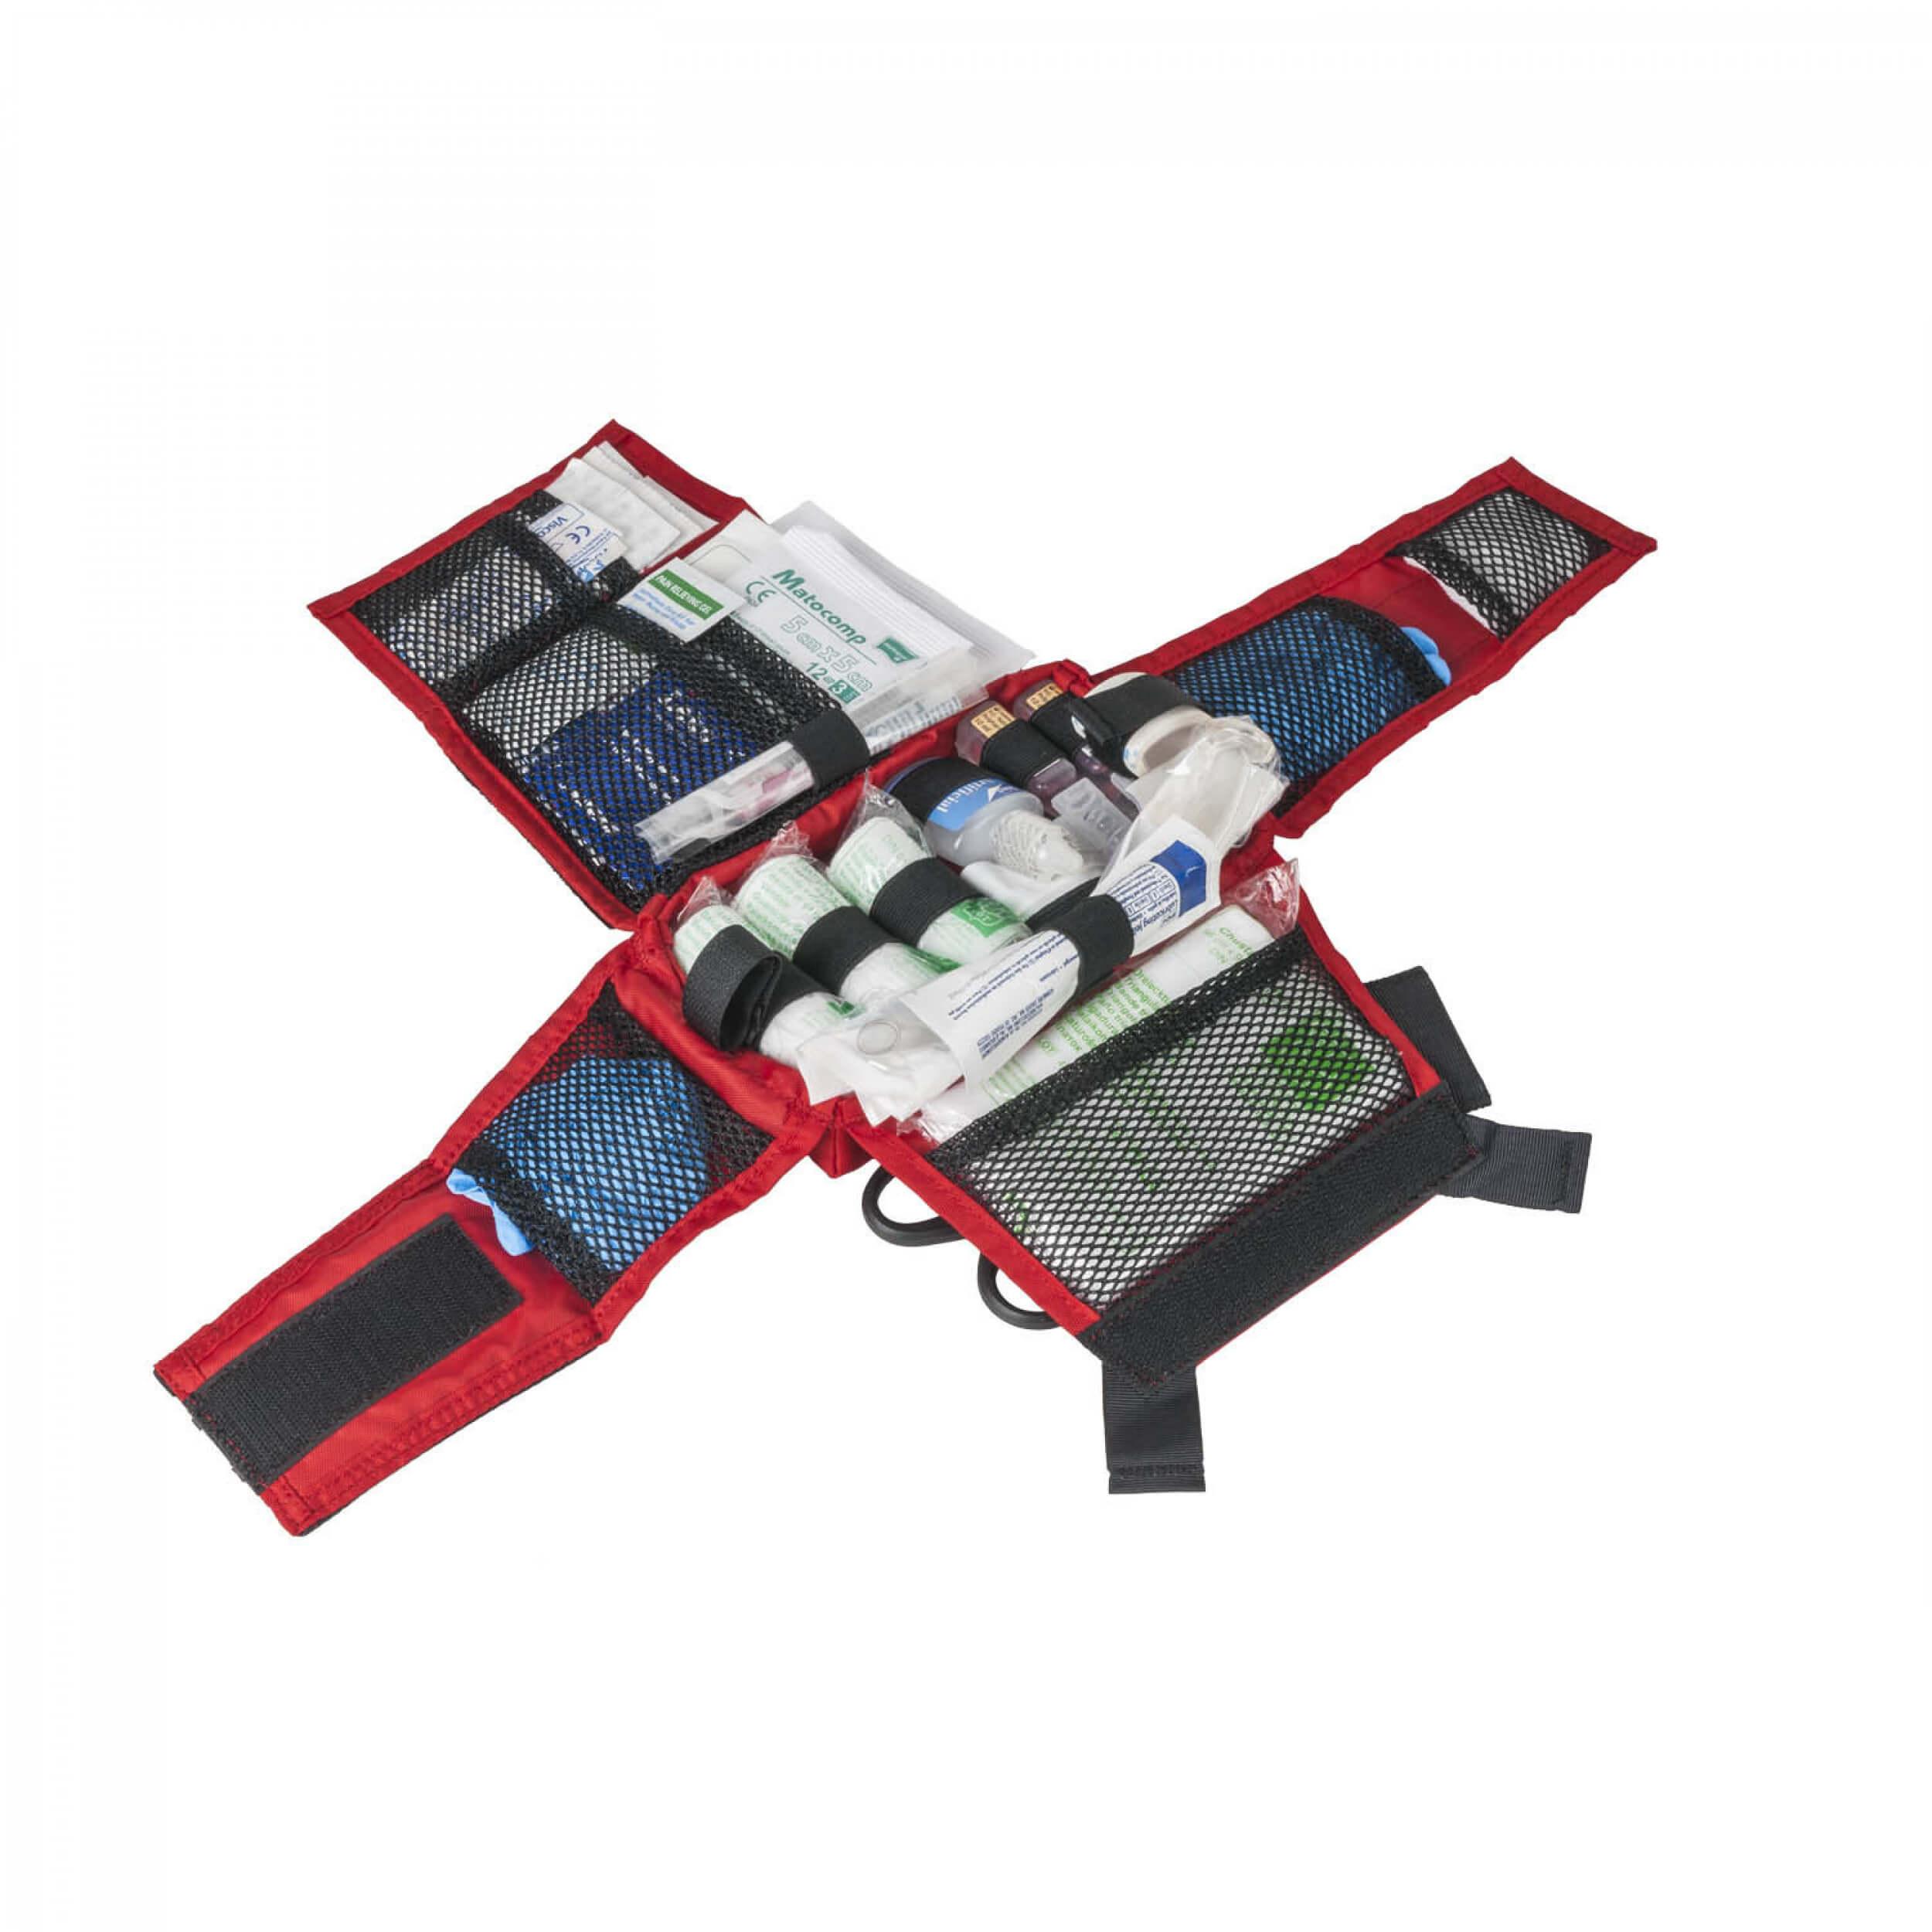 Helikon-Tex Modular Individual Med Kit Pouch -Cordura- Kryptek Mandrake